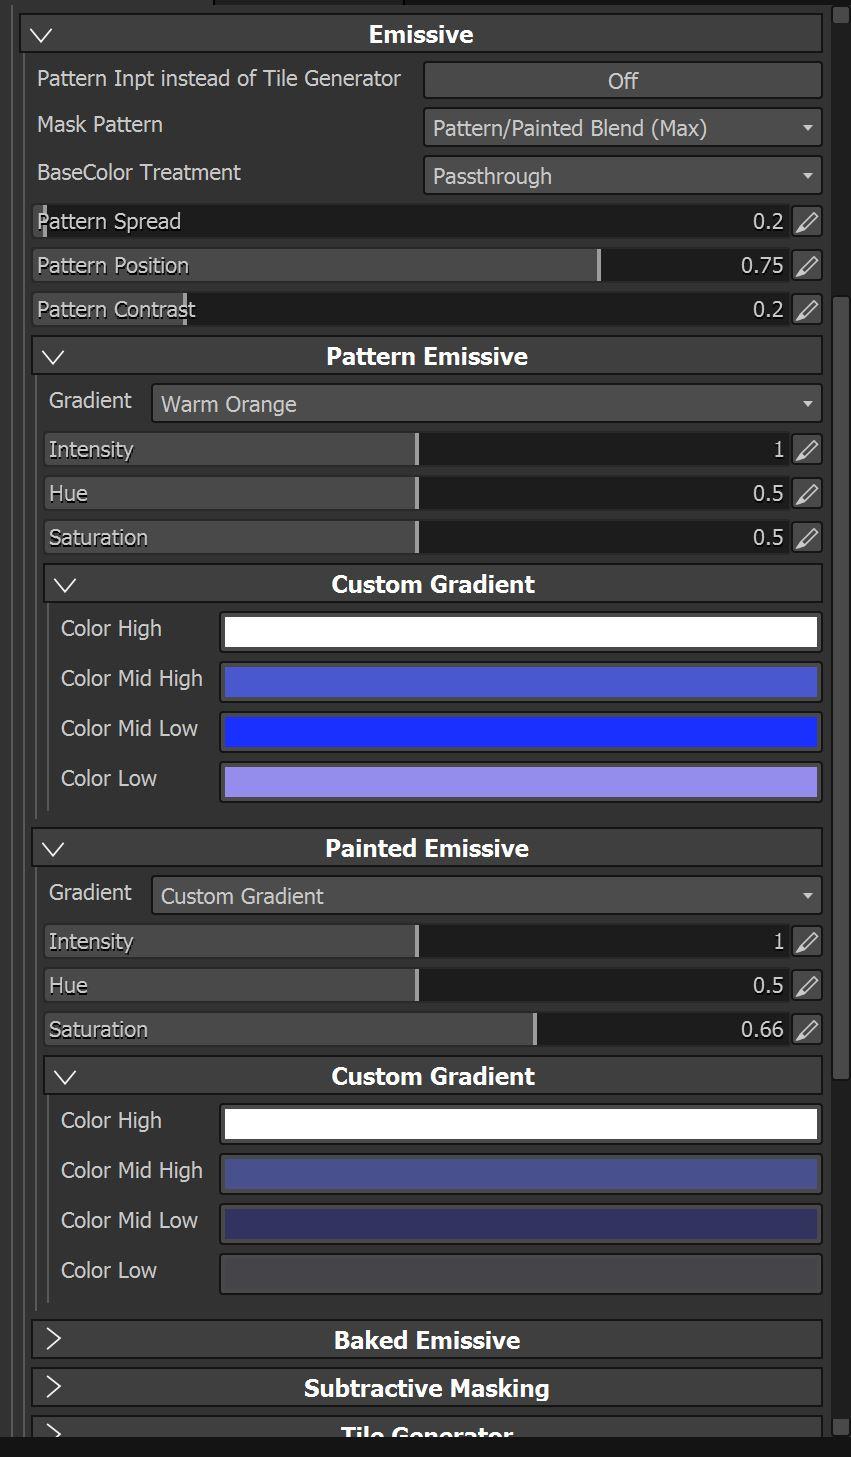 Emissive Filter New Options